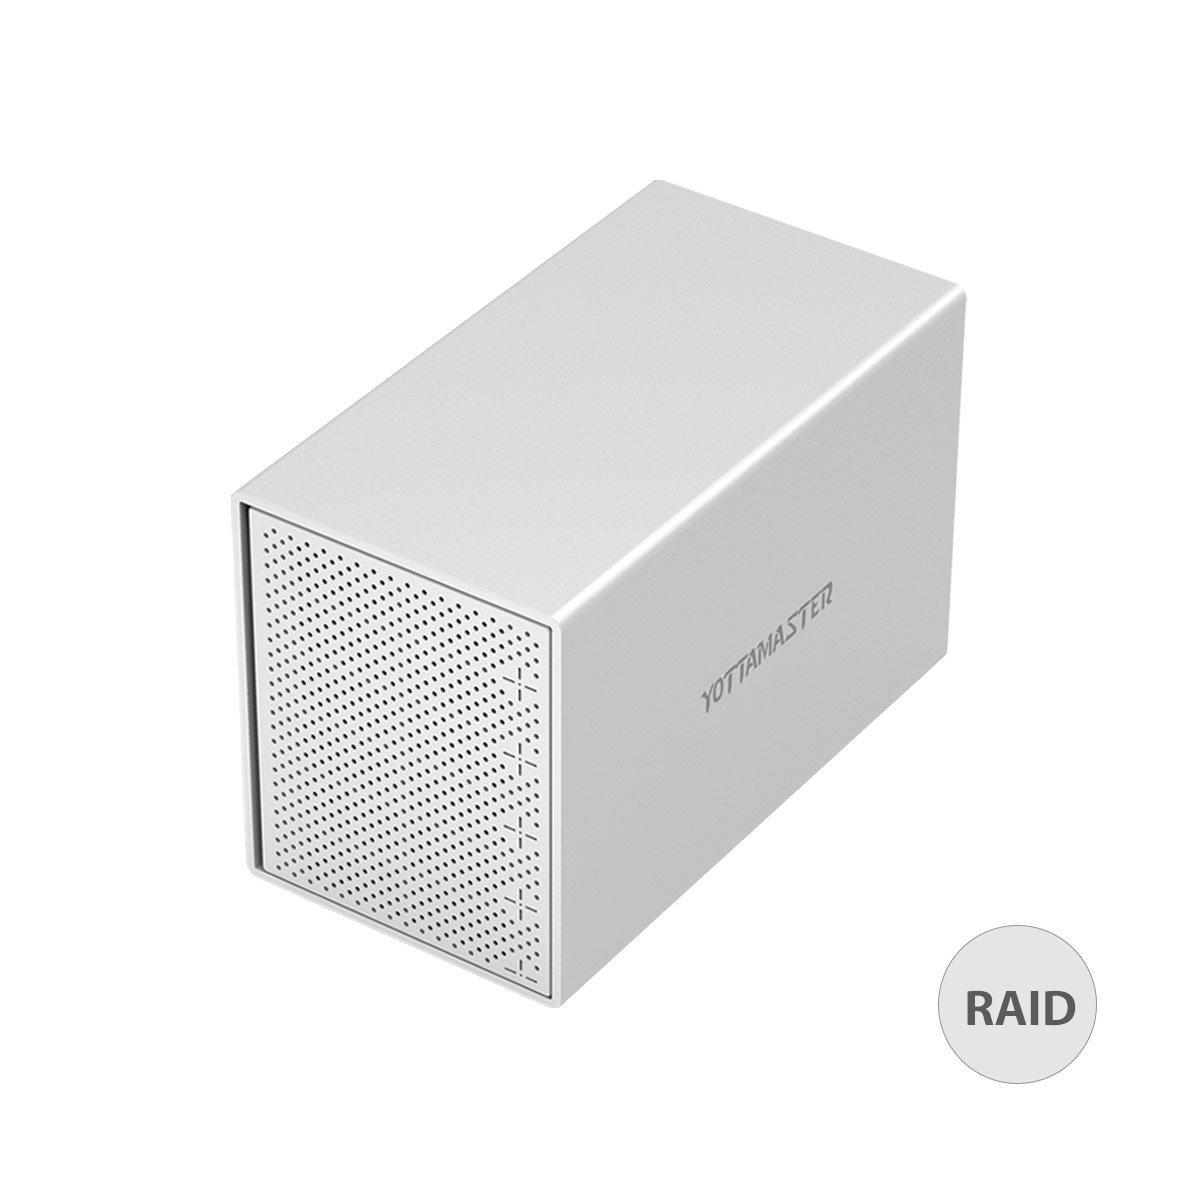 Yottamaster Aluminum Alloy 5 Bay 3.5 Inch USB3.1 Gen1 Type-C RAID External HDD Enclosure SATA3.0 Support 5x10TB & UASP -Silver by Yottamaster (Image #1)